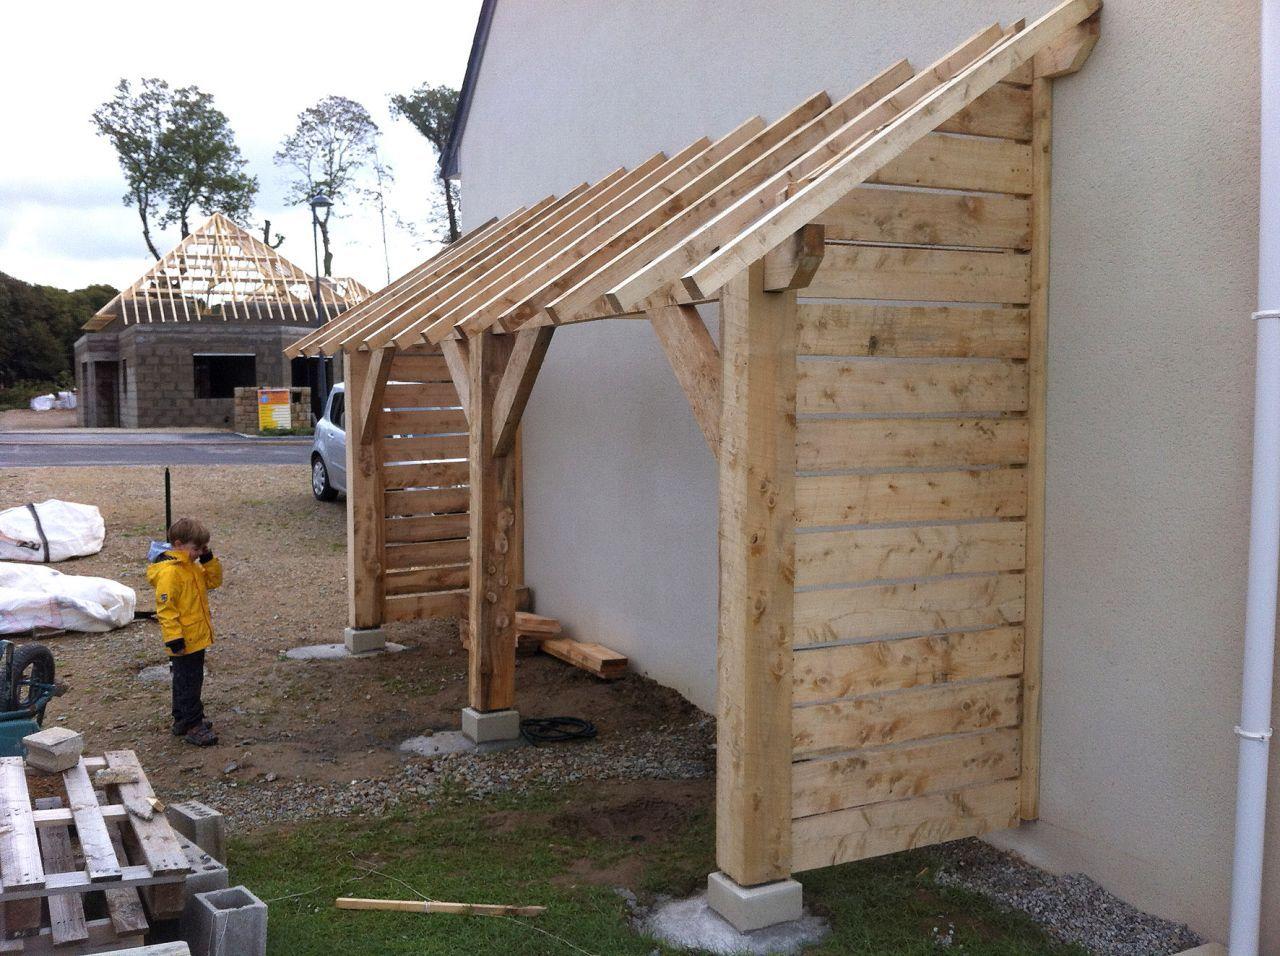 Construire Un Abri A Velo Épinglé par lee sur garden ideas | bois de chauffage, abri